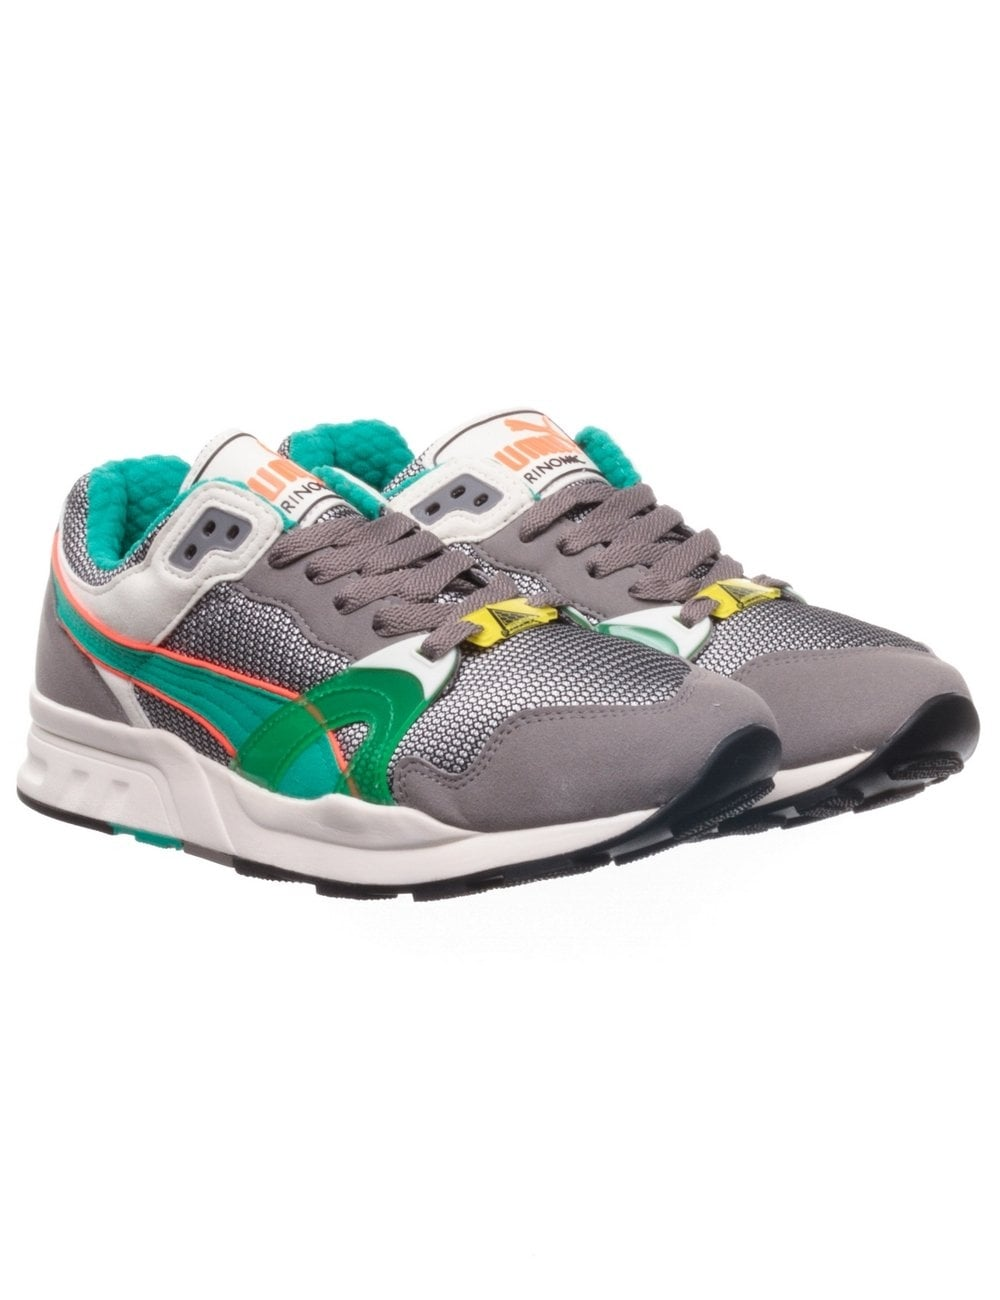 de8edced966 Puma Trinomic XT1 - Grey Green - Footwear from Fat Buddha Store UK